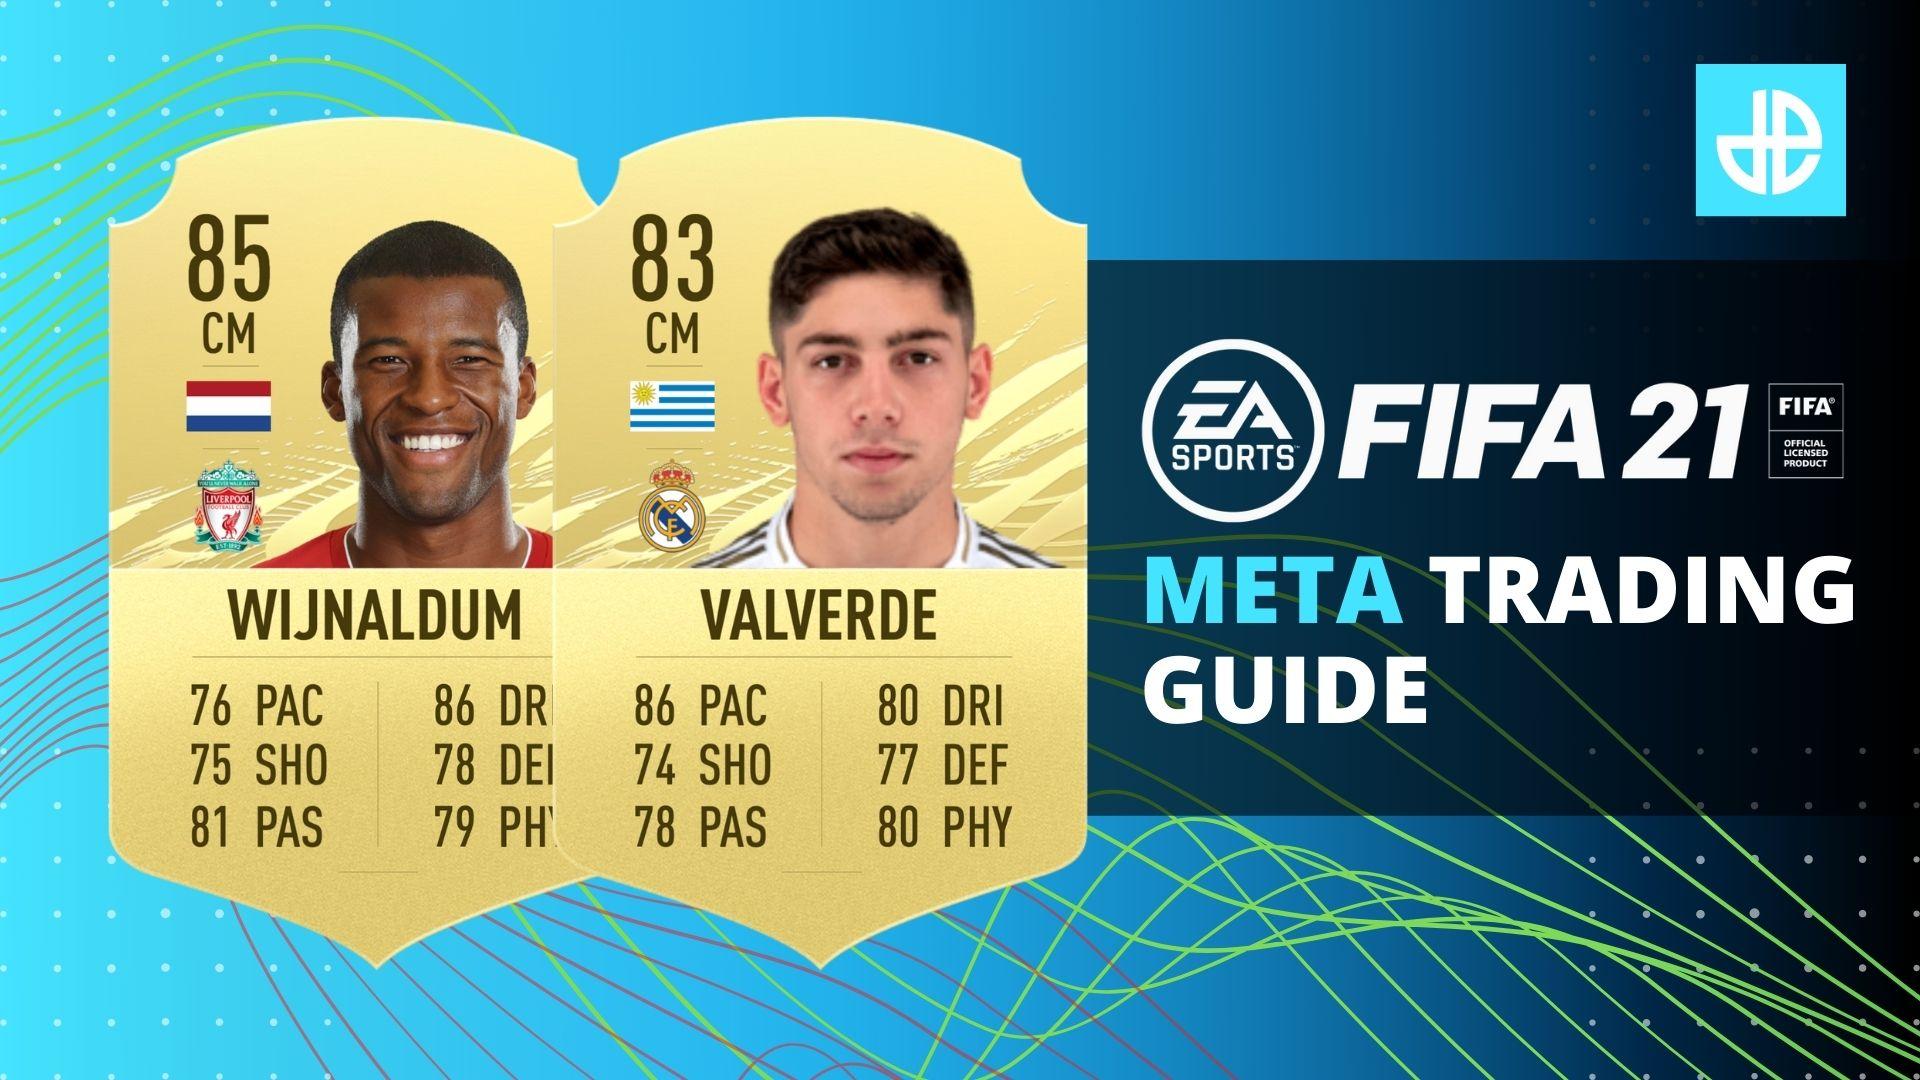 FIFA 21 trading image